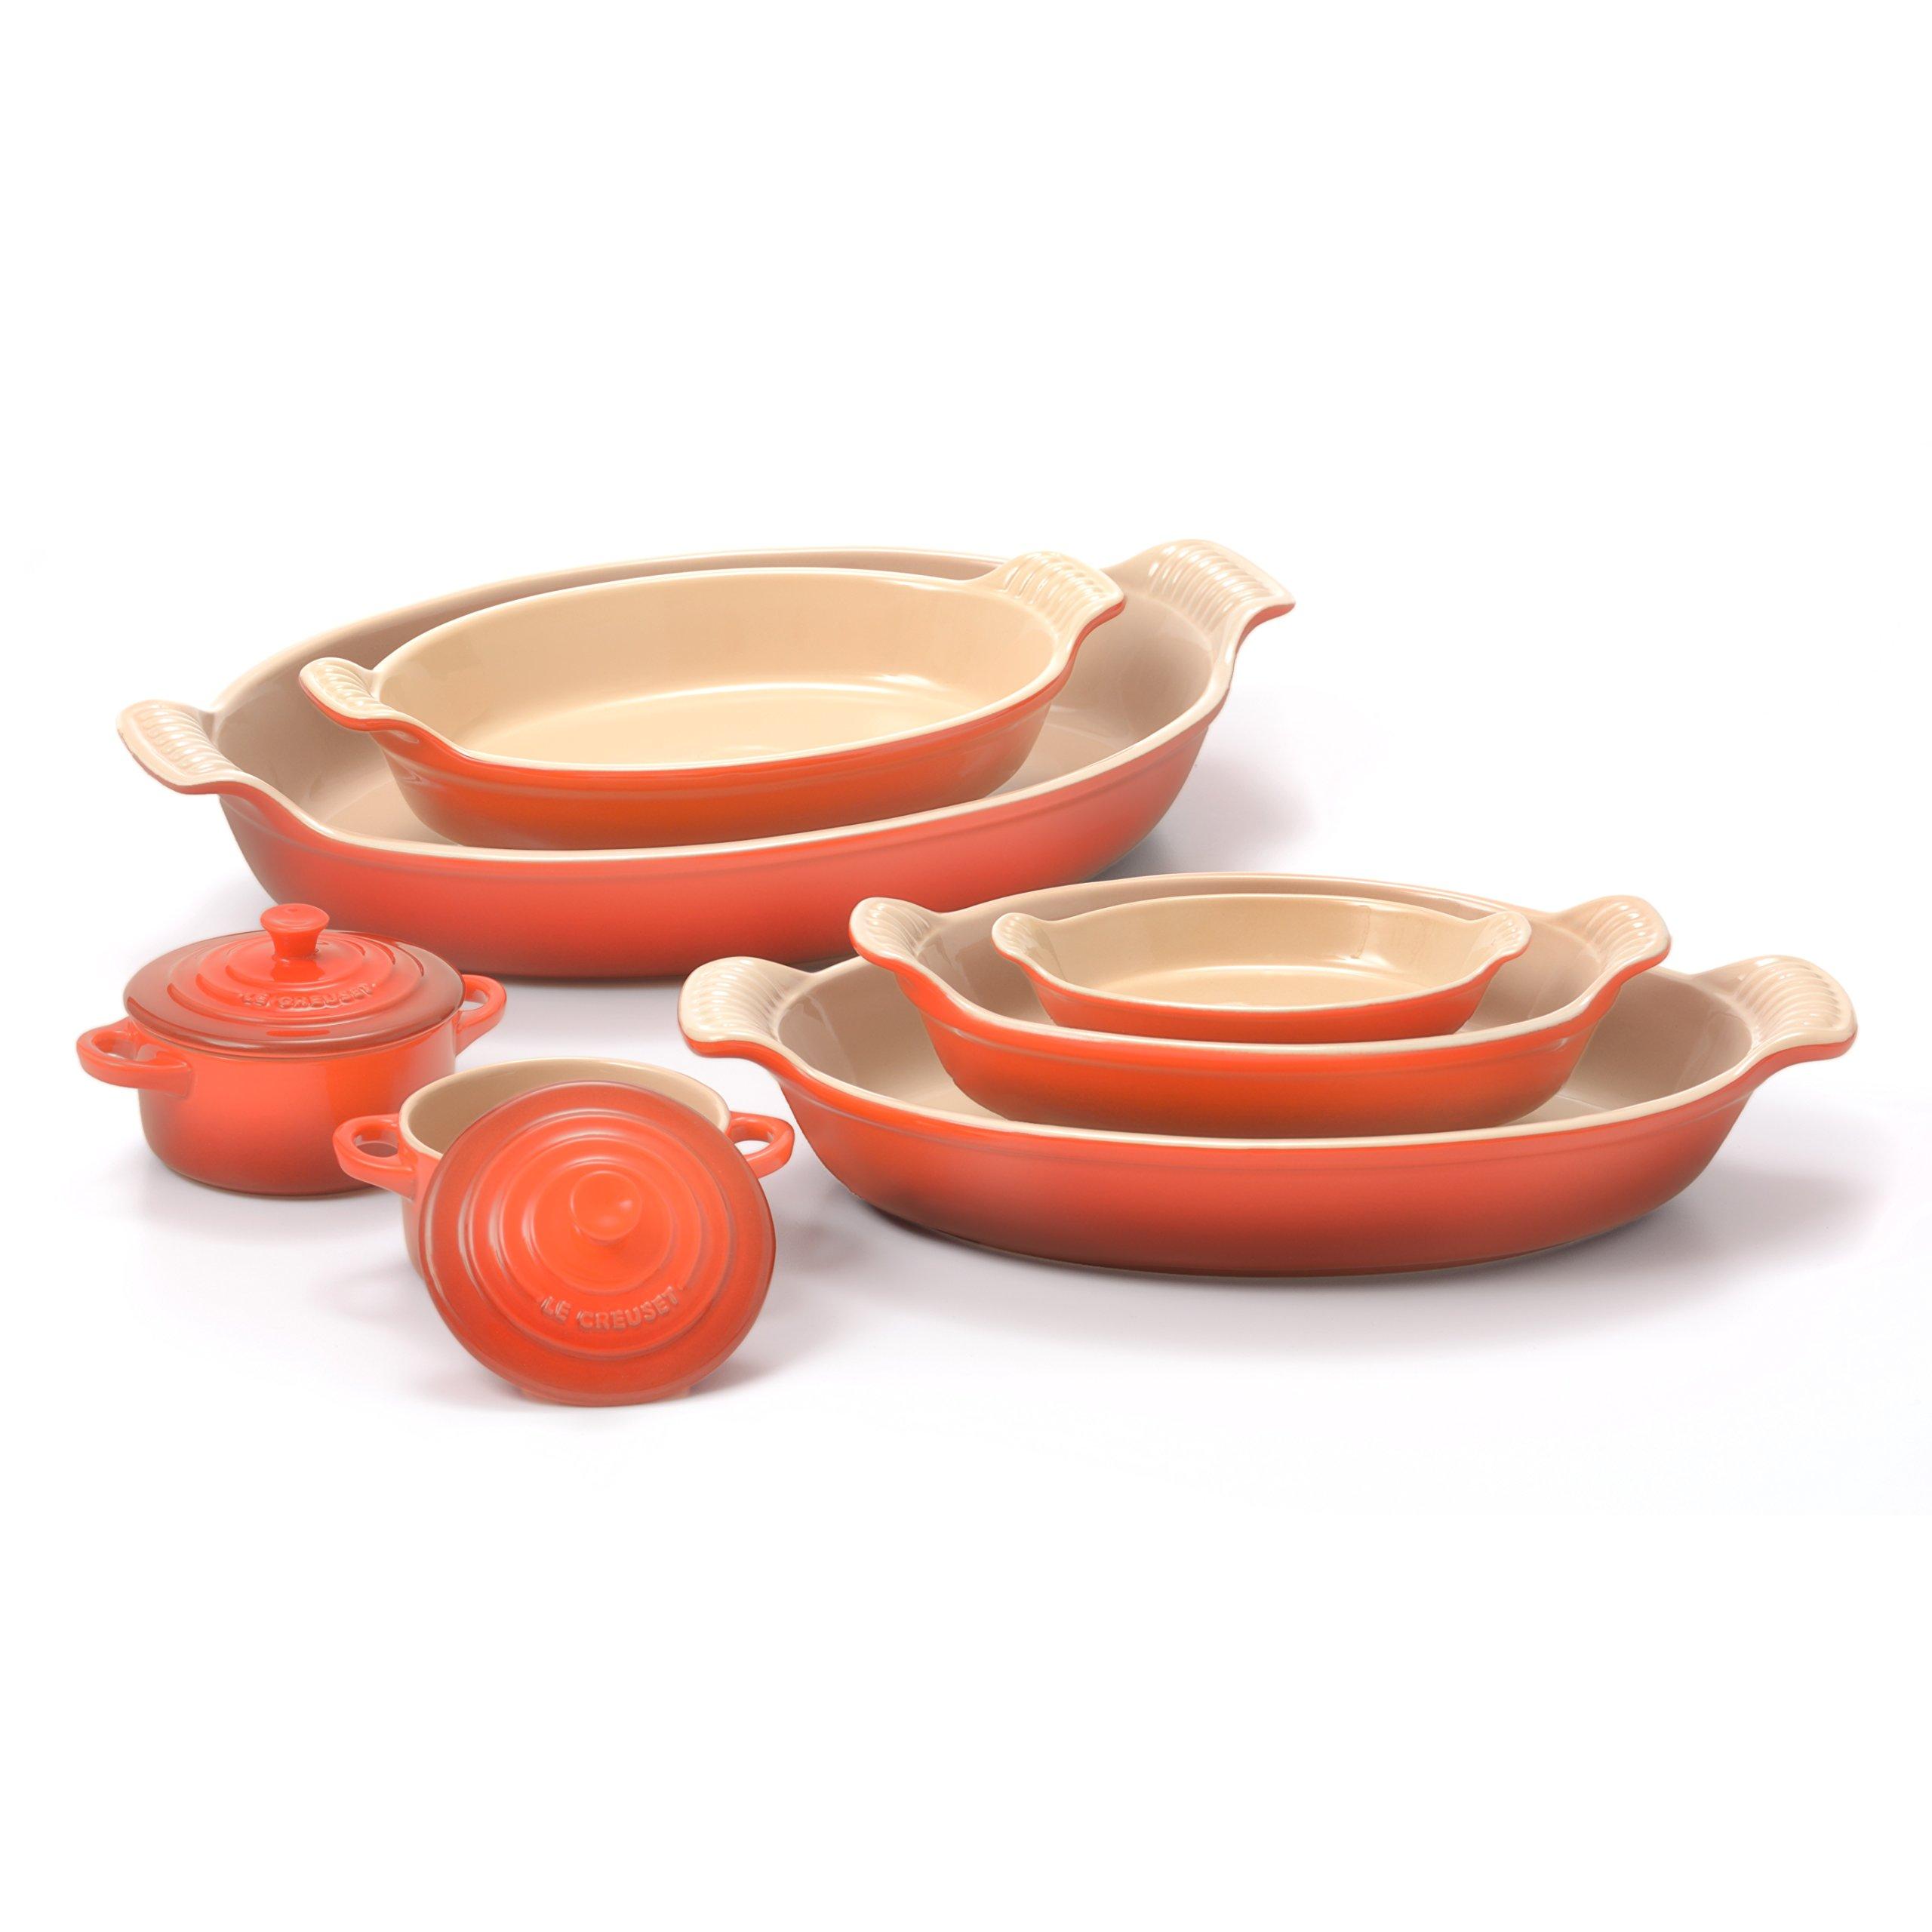 Le Creuset Heritage Flame Stoneware 5 Piece Au Gratin Dish Set with 2 Mini Cocottes